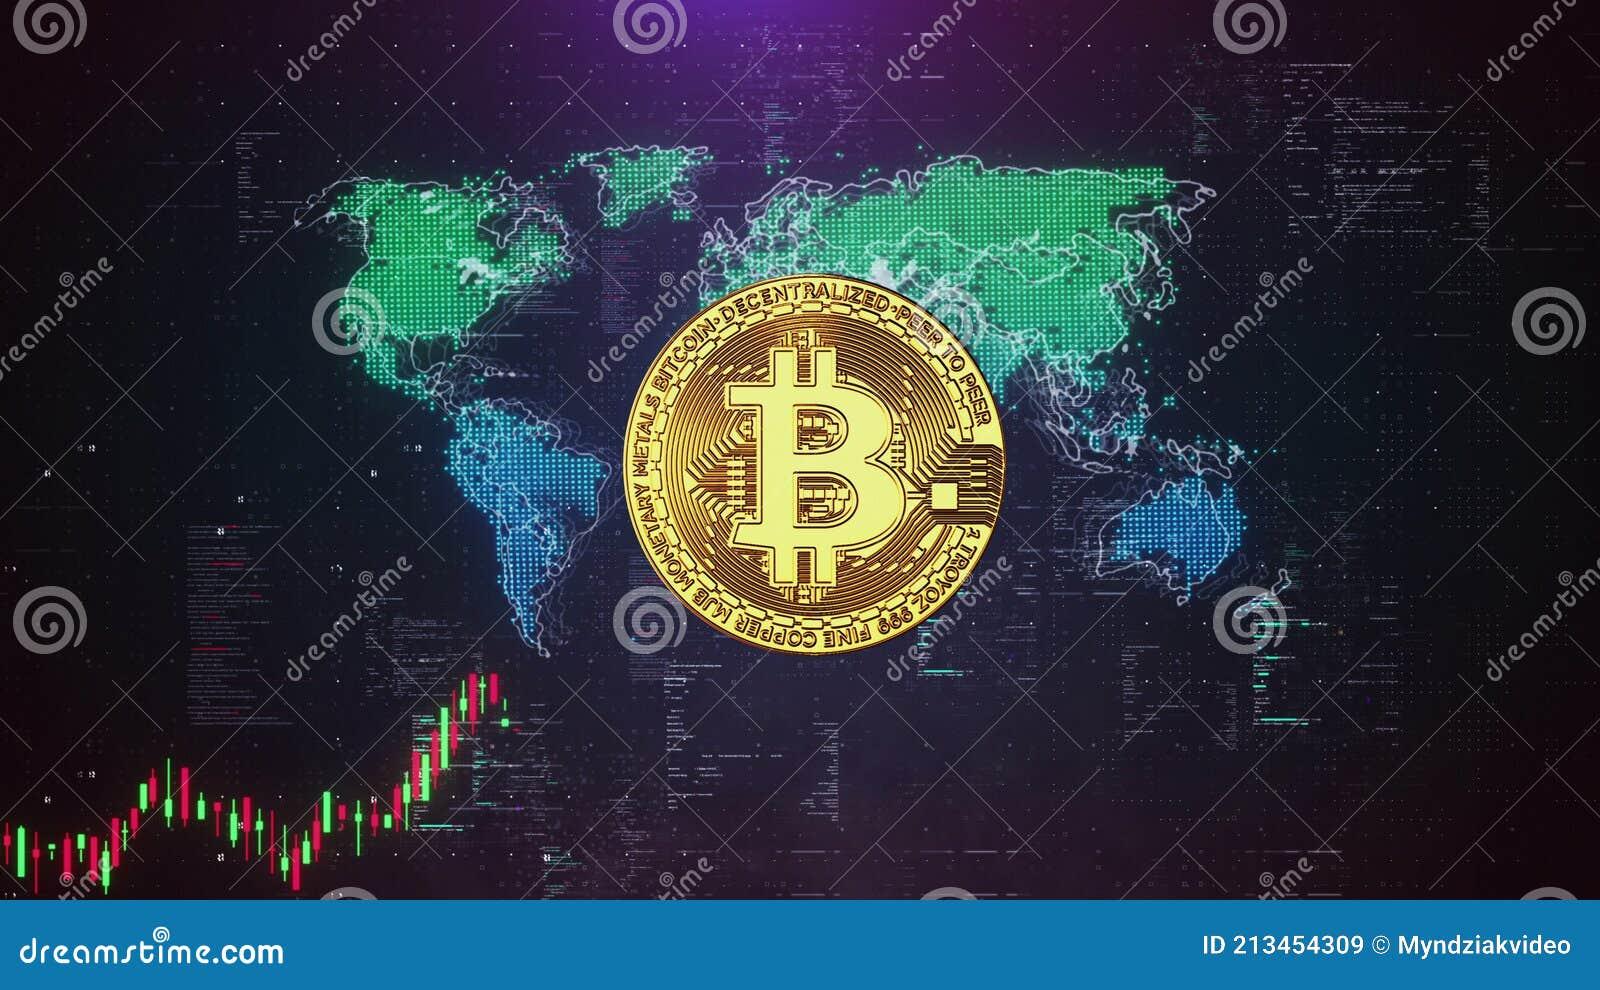 futuro sistema bitcoin wer hat mit erfahrung bitcoin commerciante